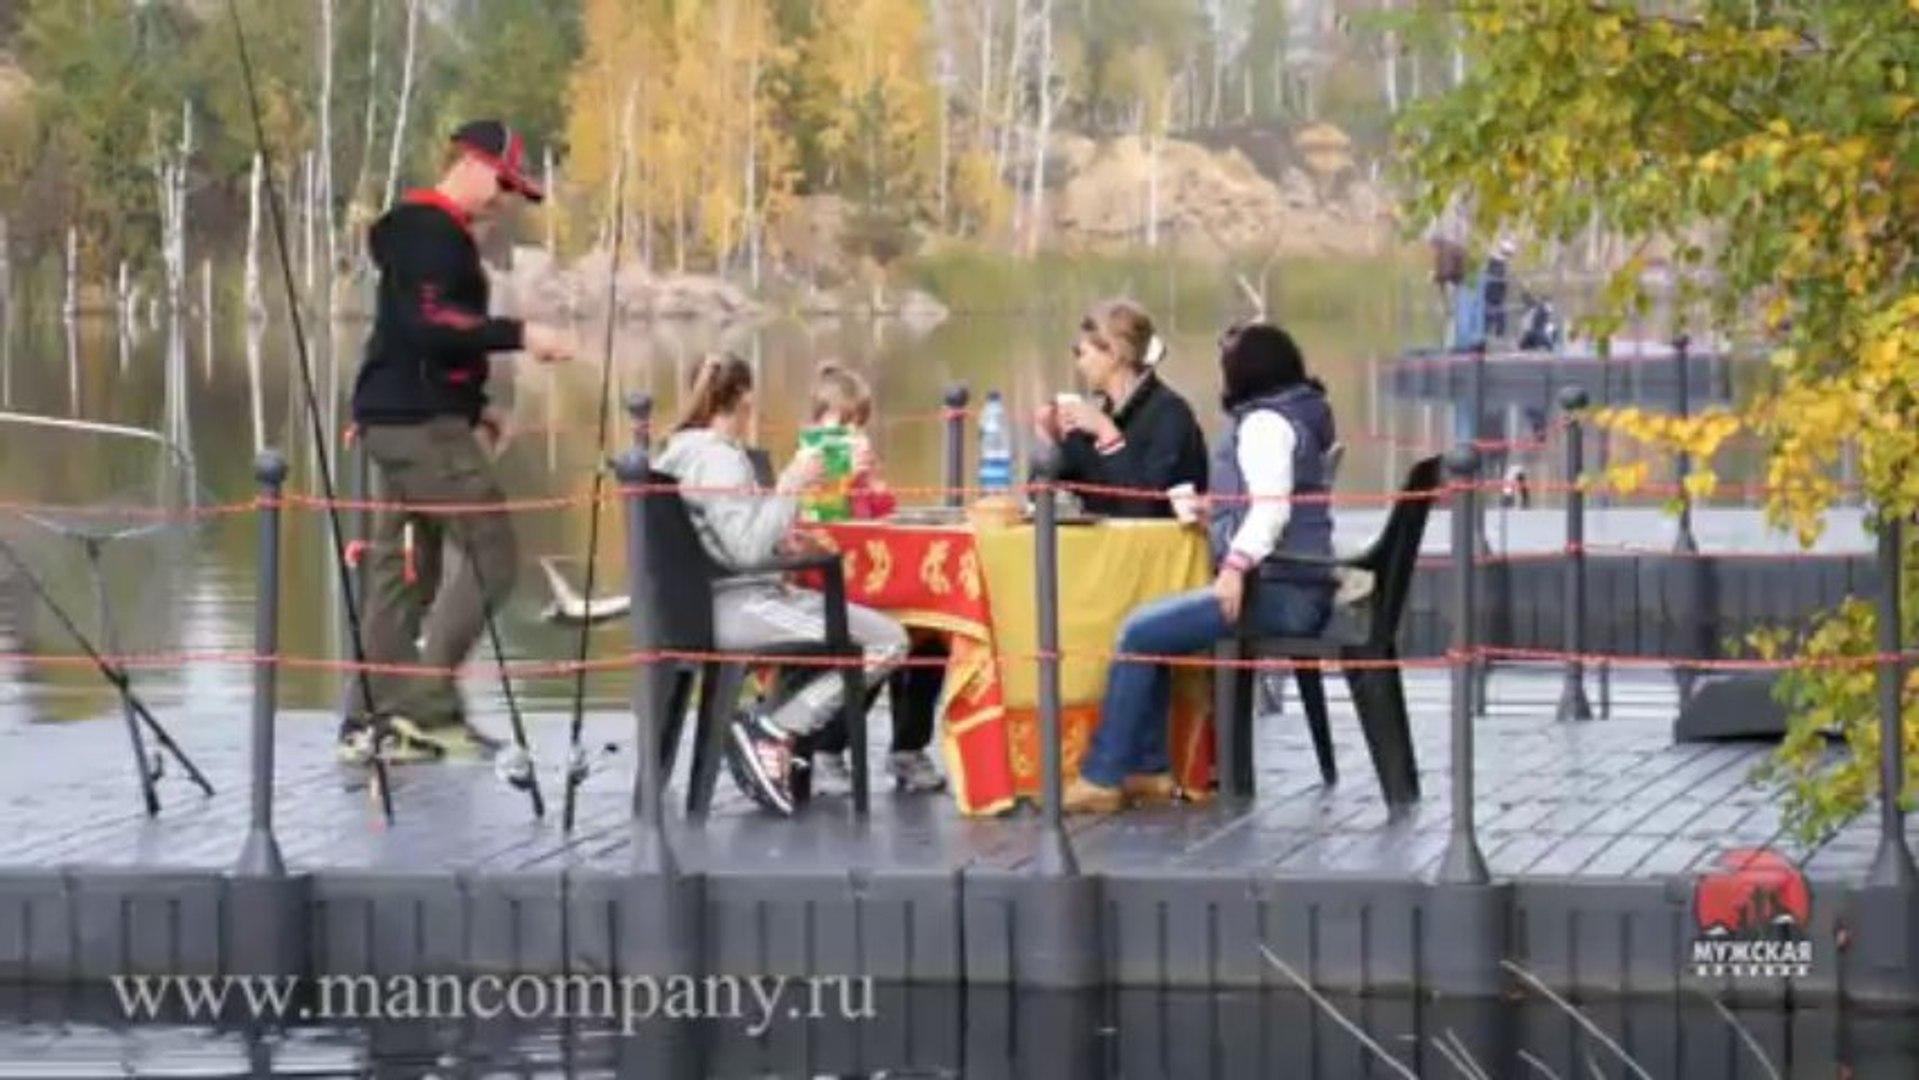 Клип: Ловля на платнике. Семейная рыбалка видео Full HD